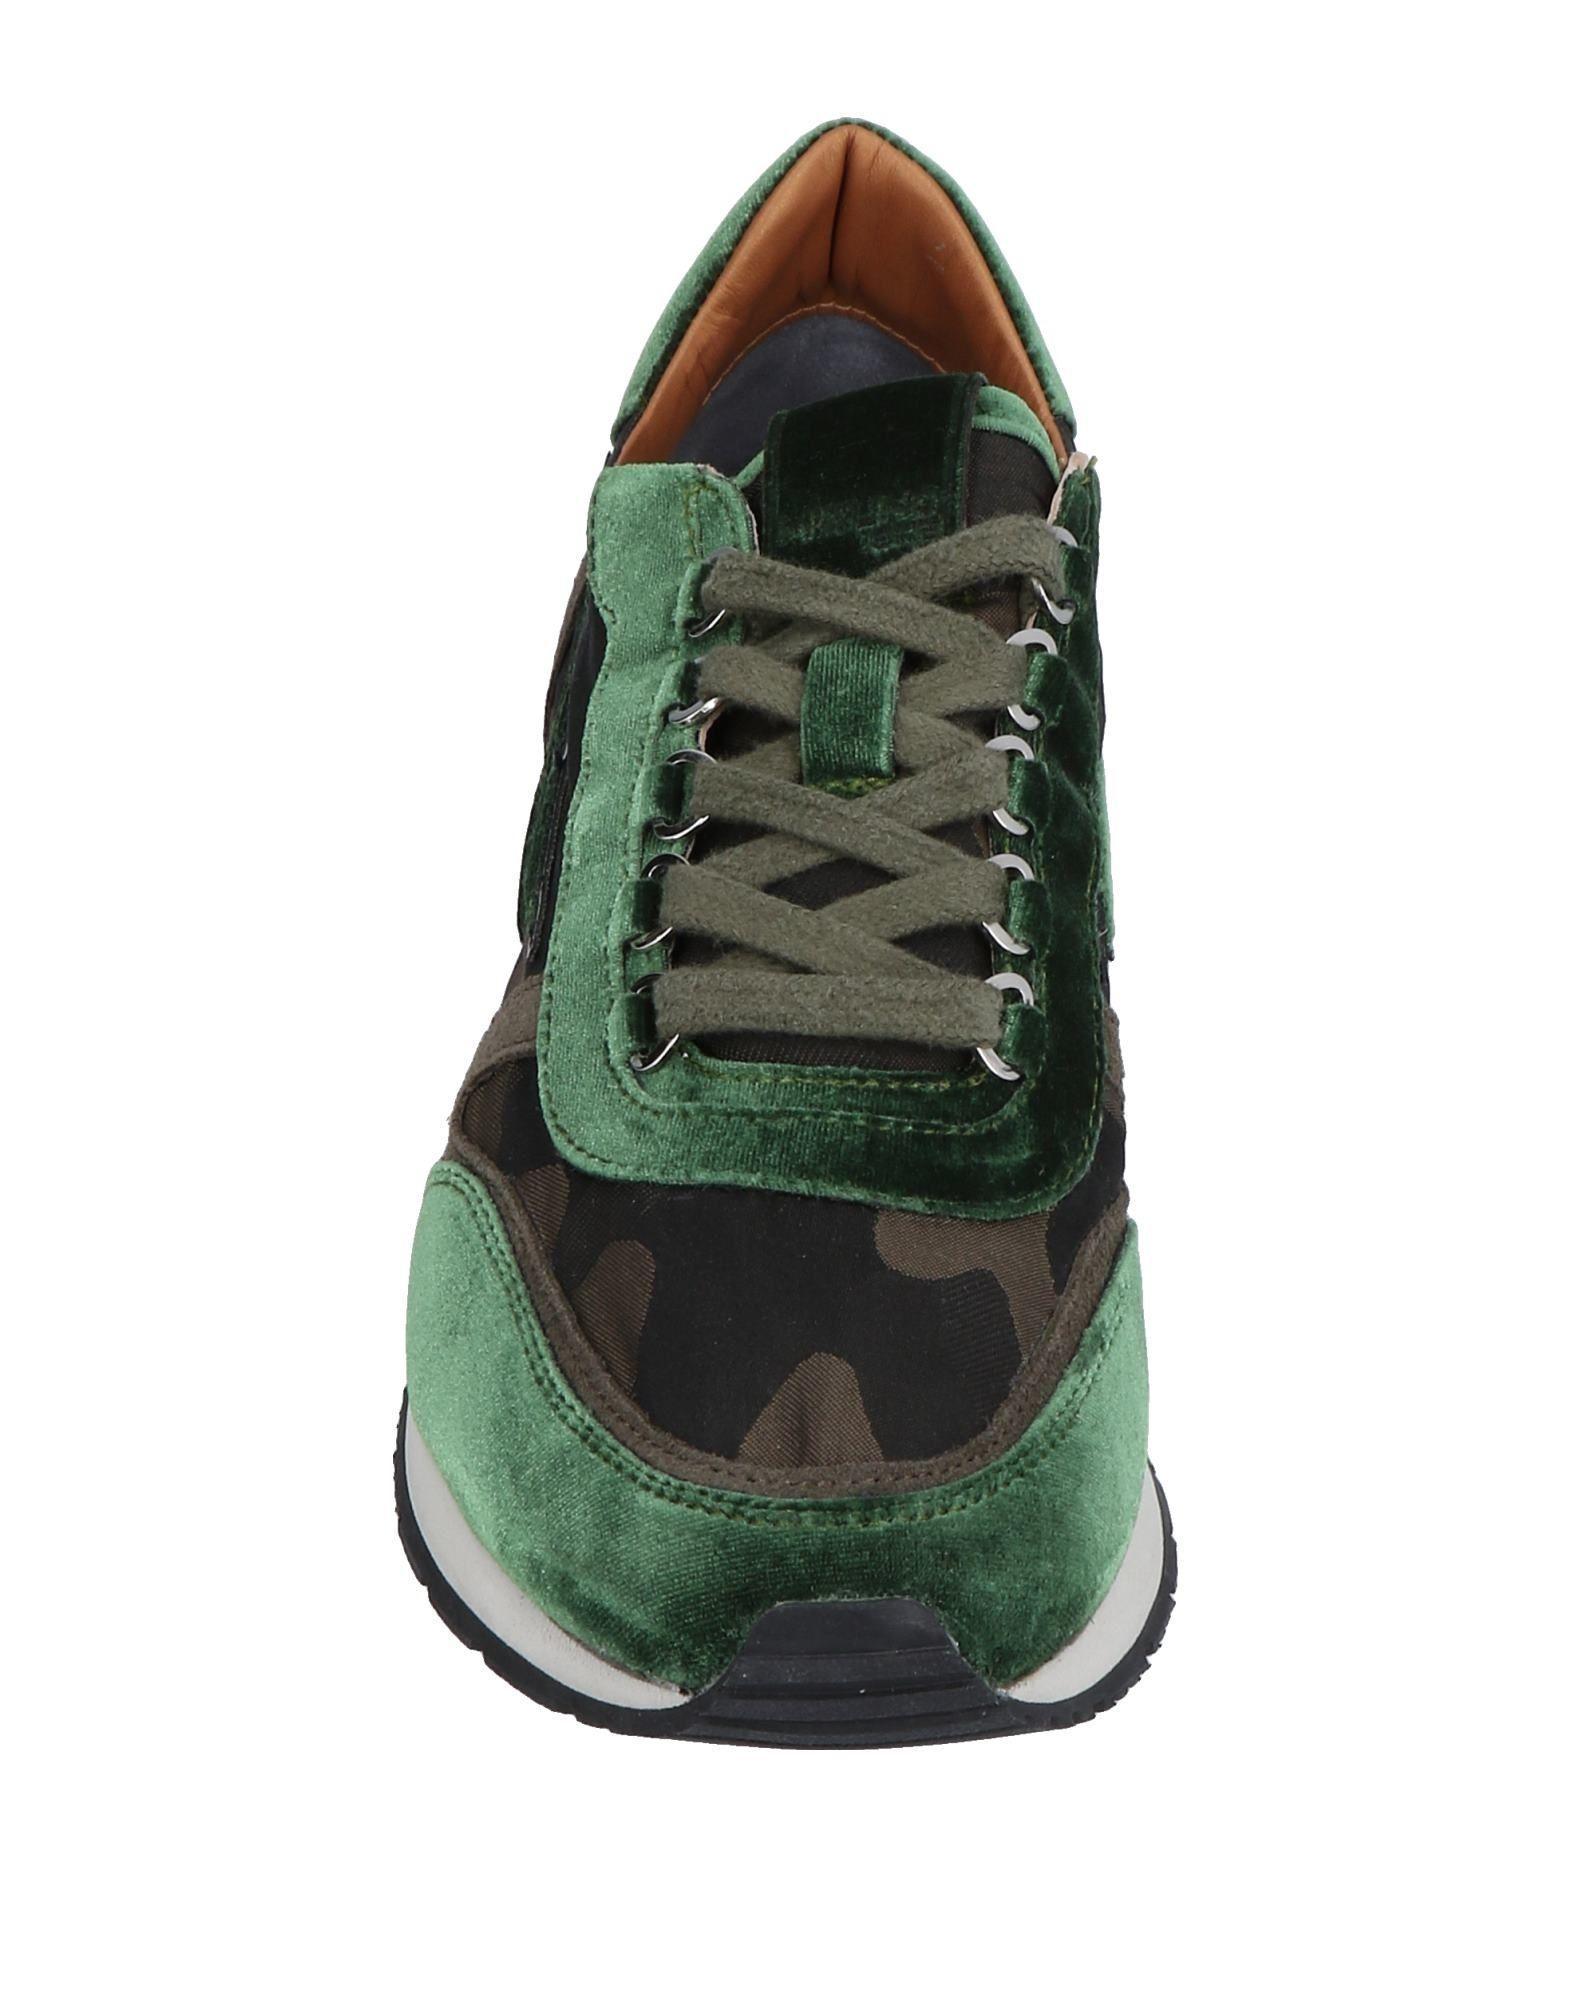 Mizuno Low-tops & Sneakers in Green